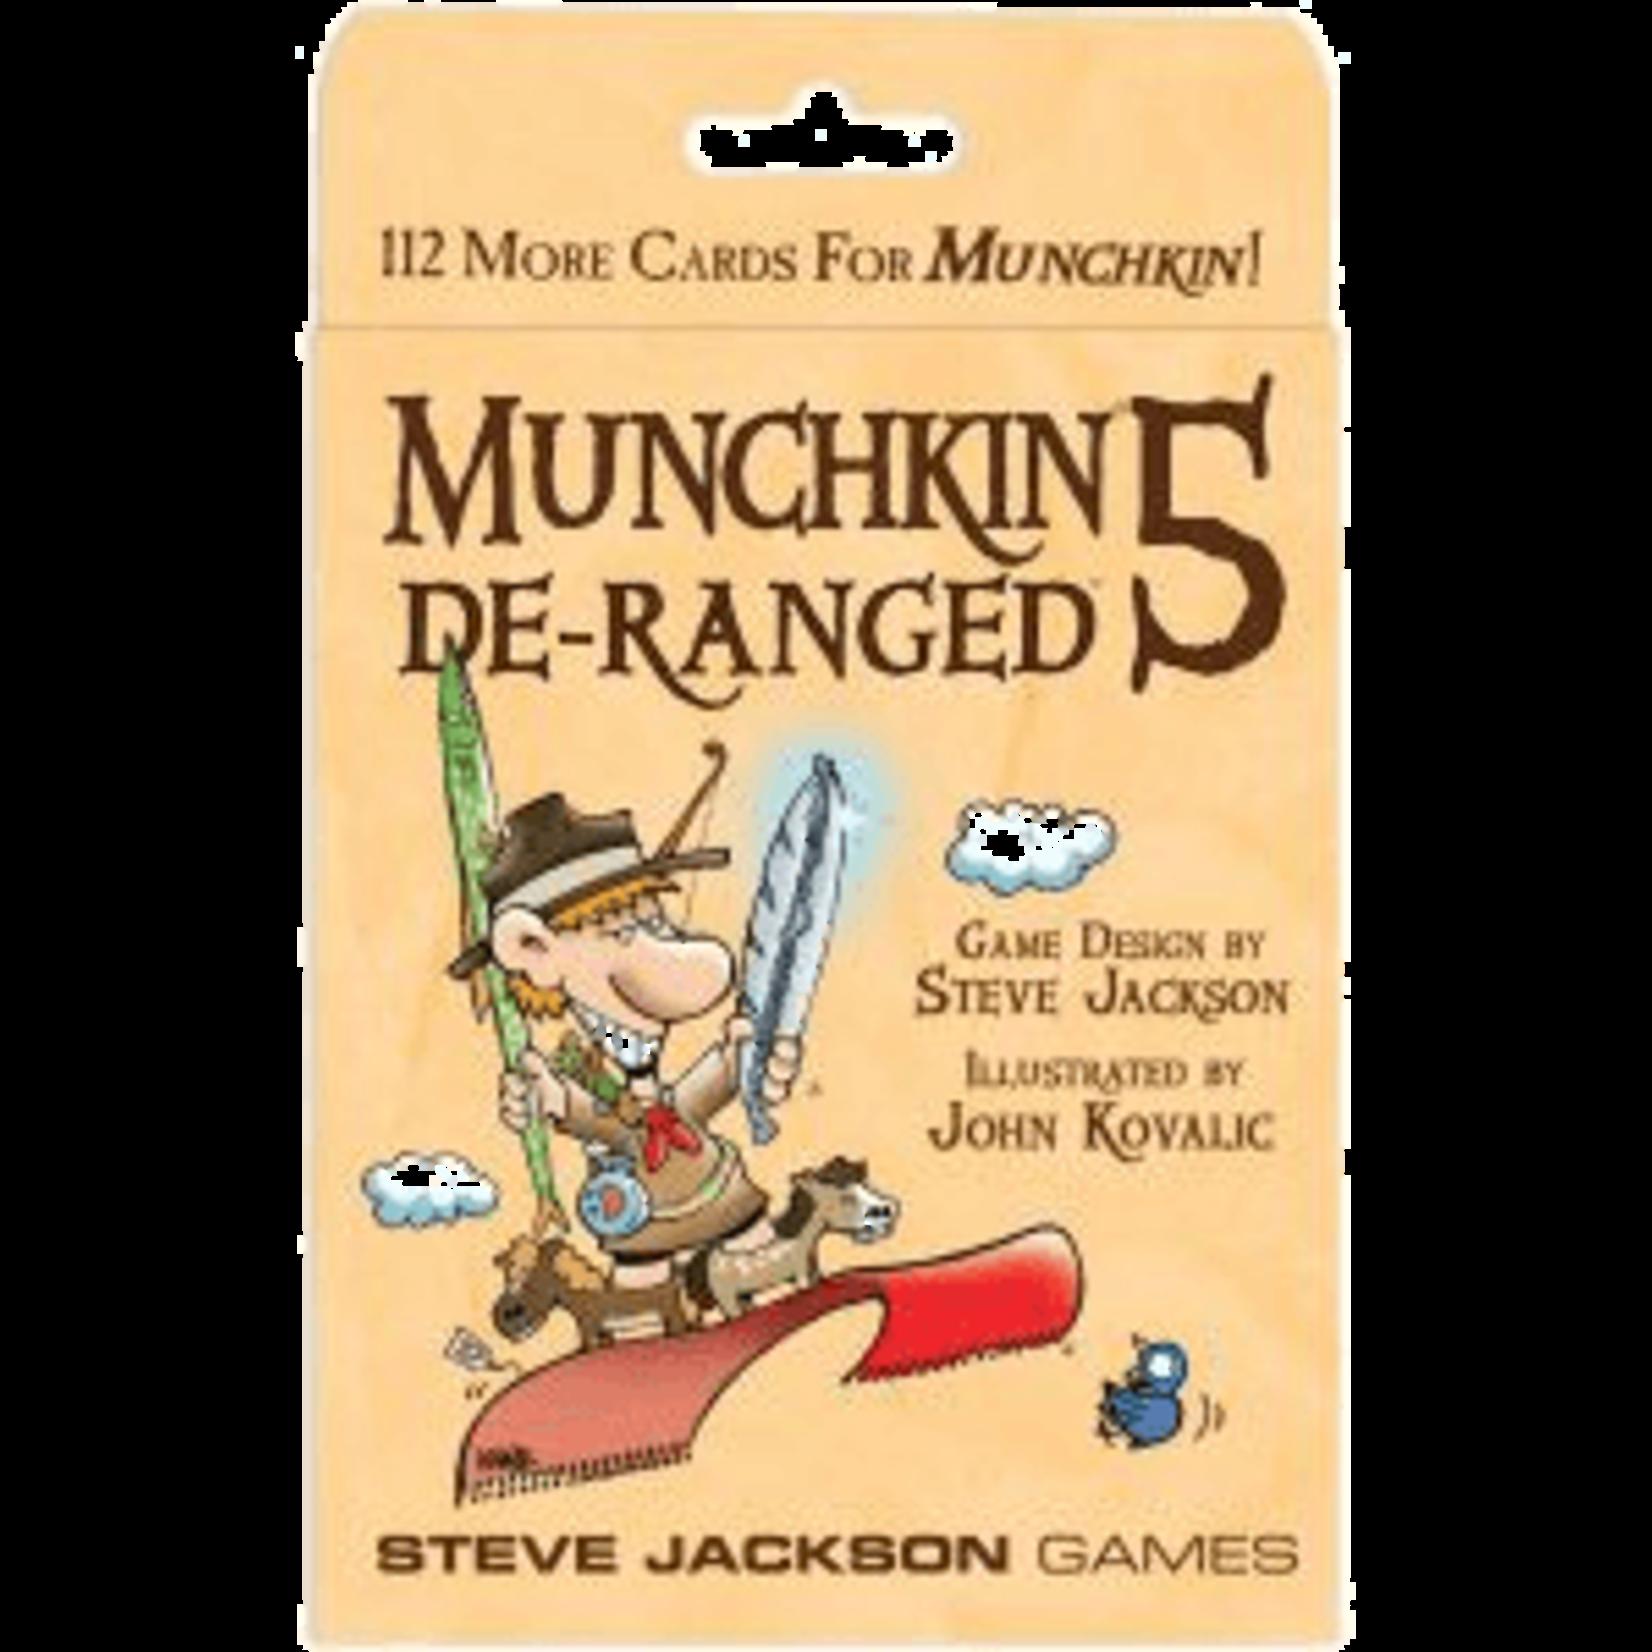 Steve Jackson Games Munchkin 5: De-Ranged Expansion